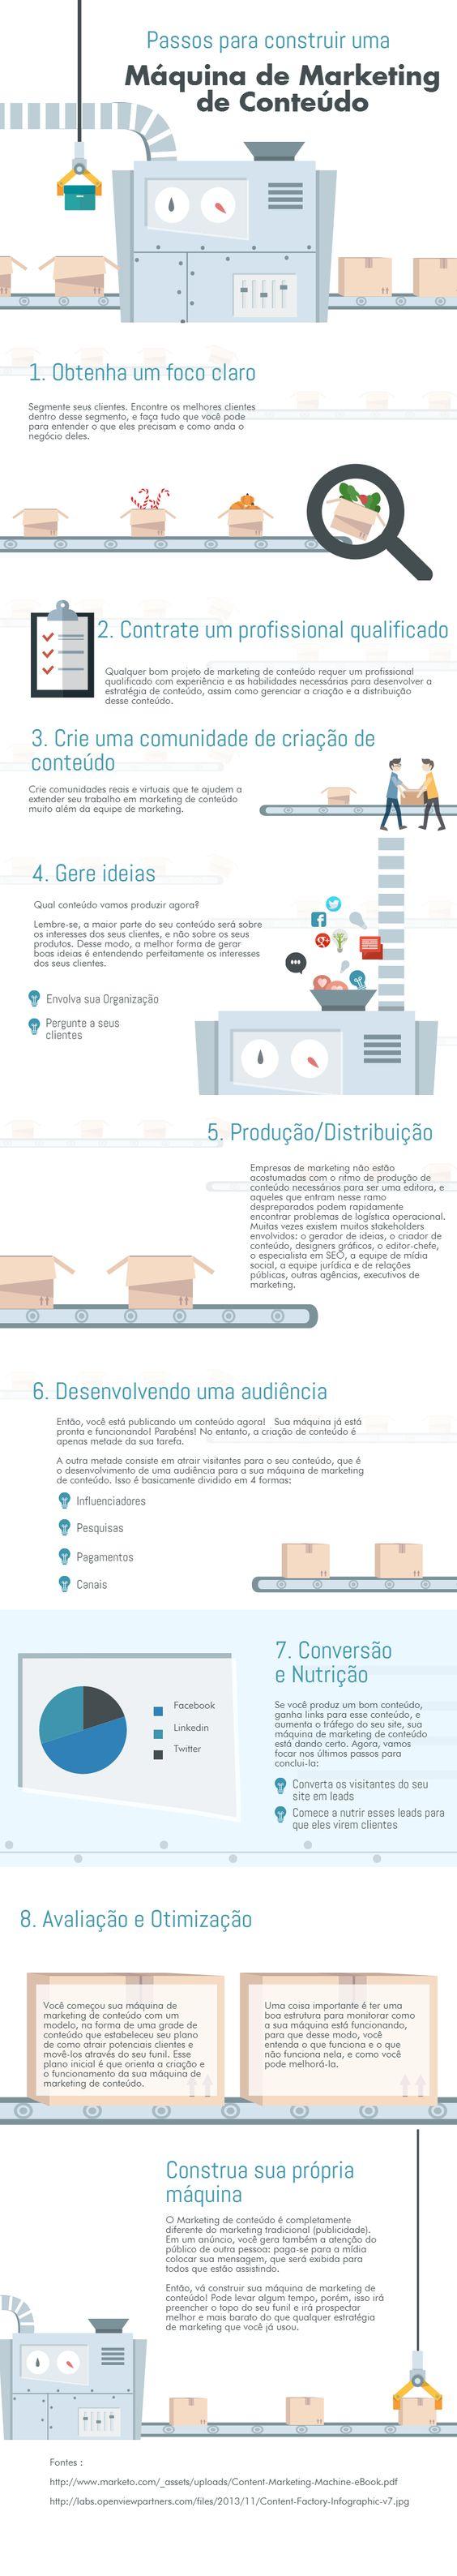 infografico maquina marketing